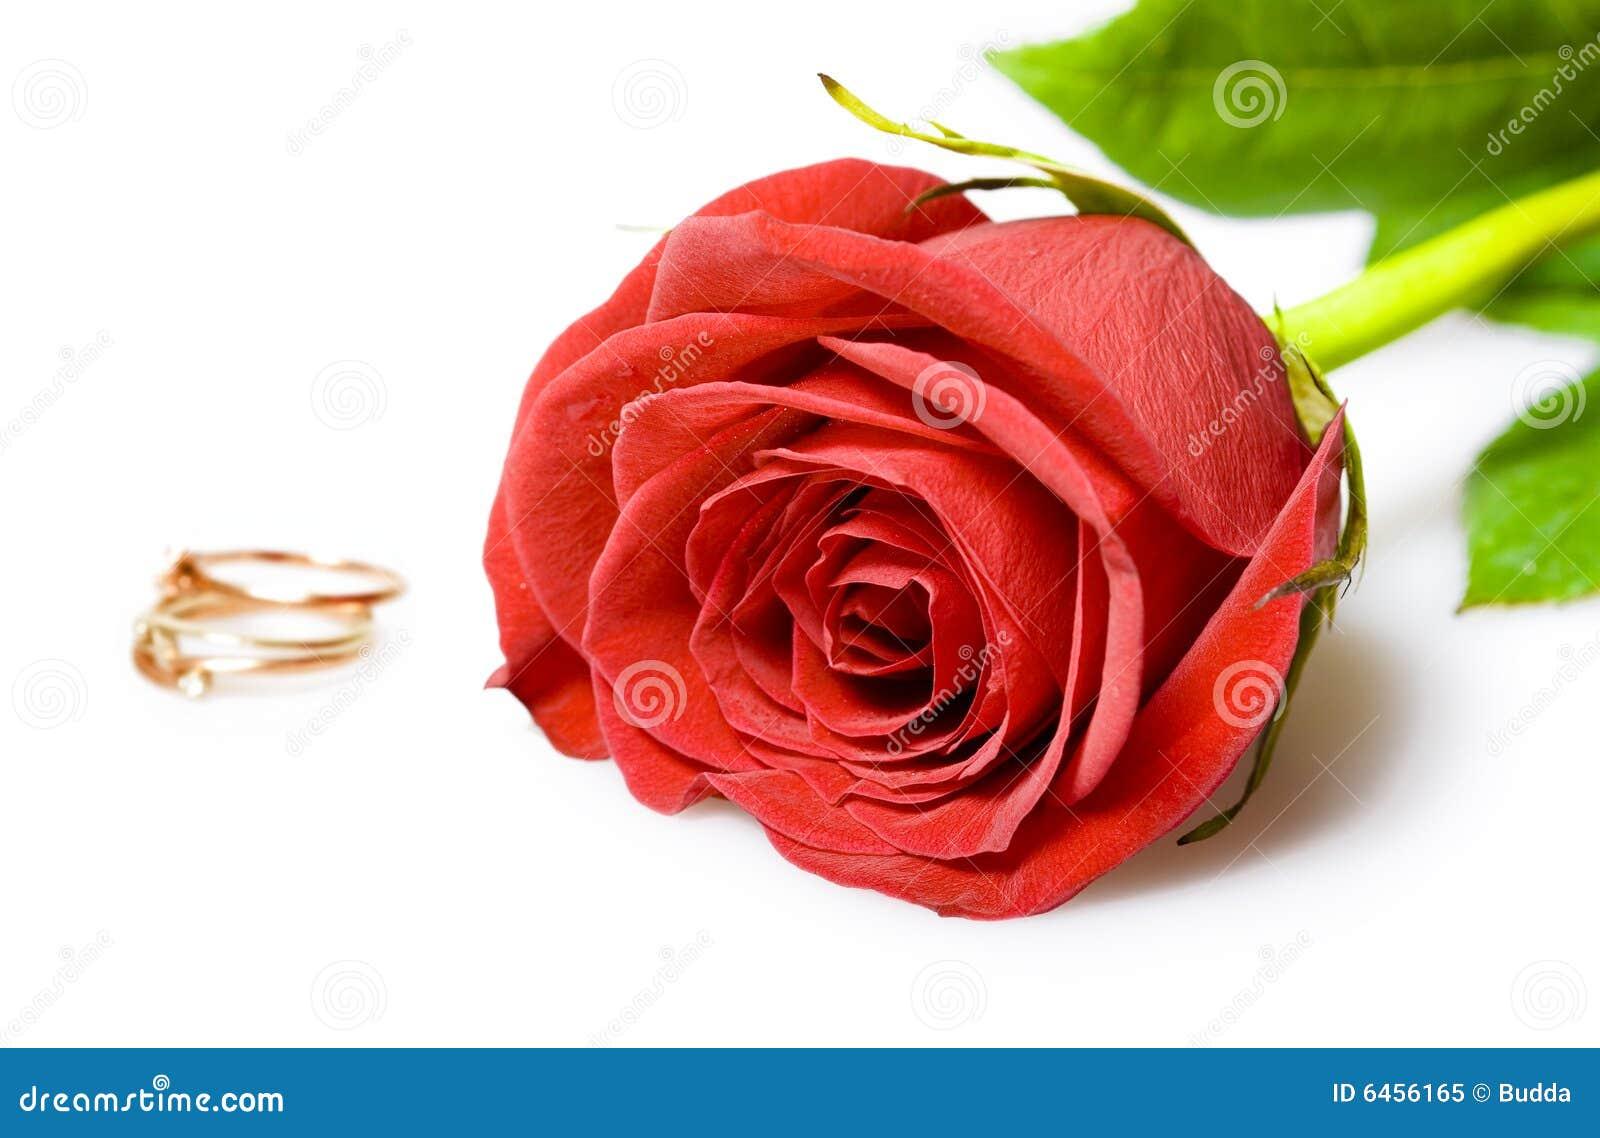 red-rose-gold-wedding-rings-6456165.jpg